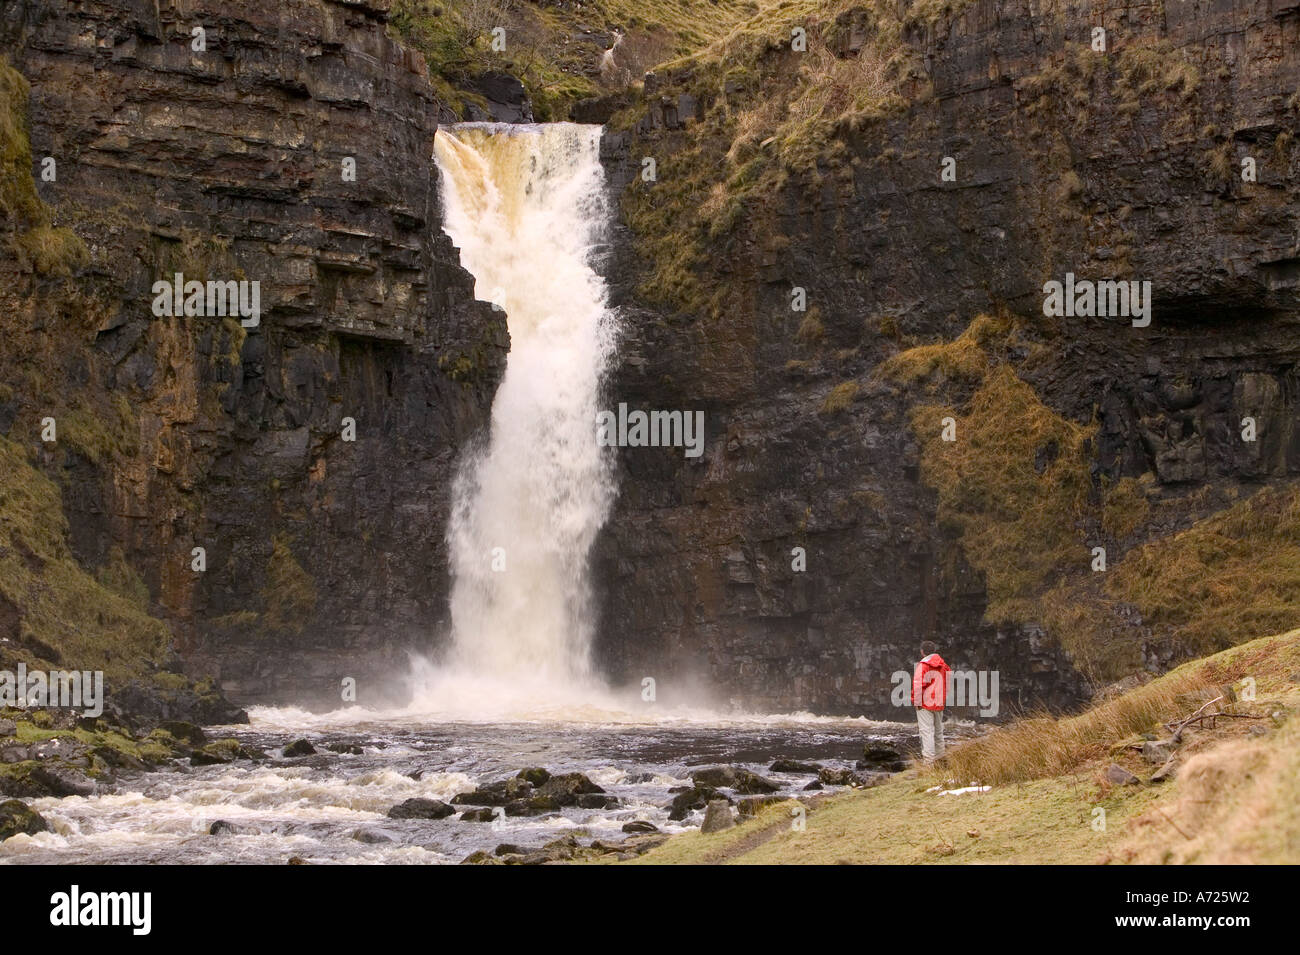 Inver tote waterfalls, Trotternish Peninsular, Isle of Skye, Scotland - Stock Image